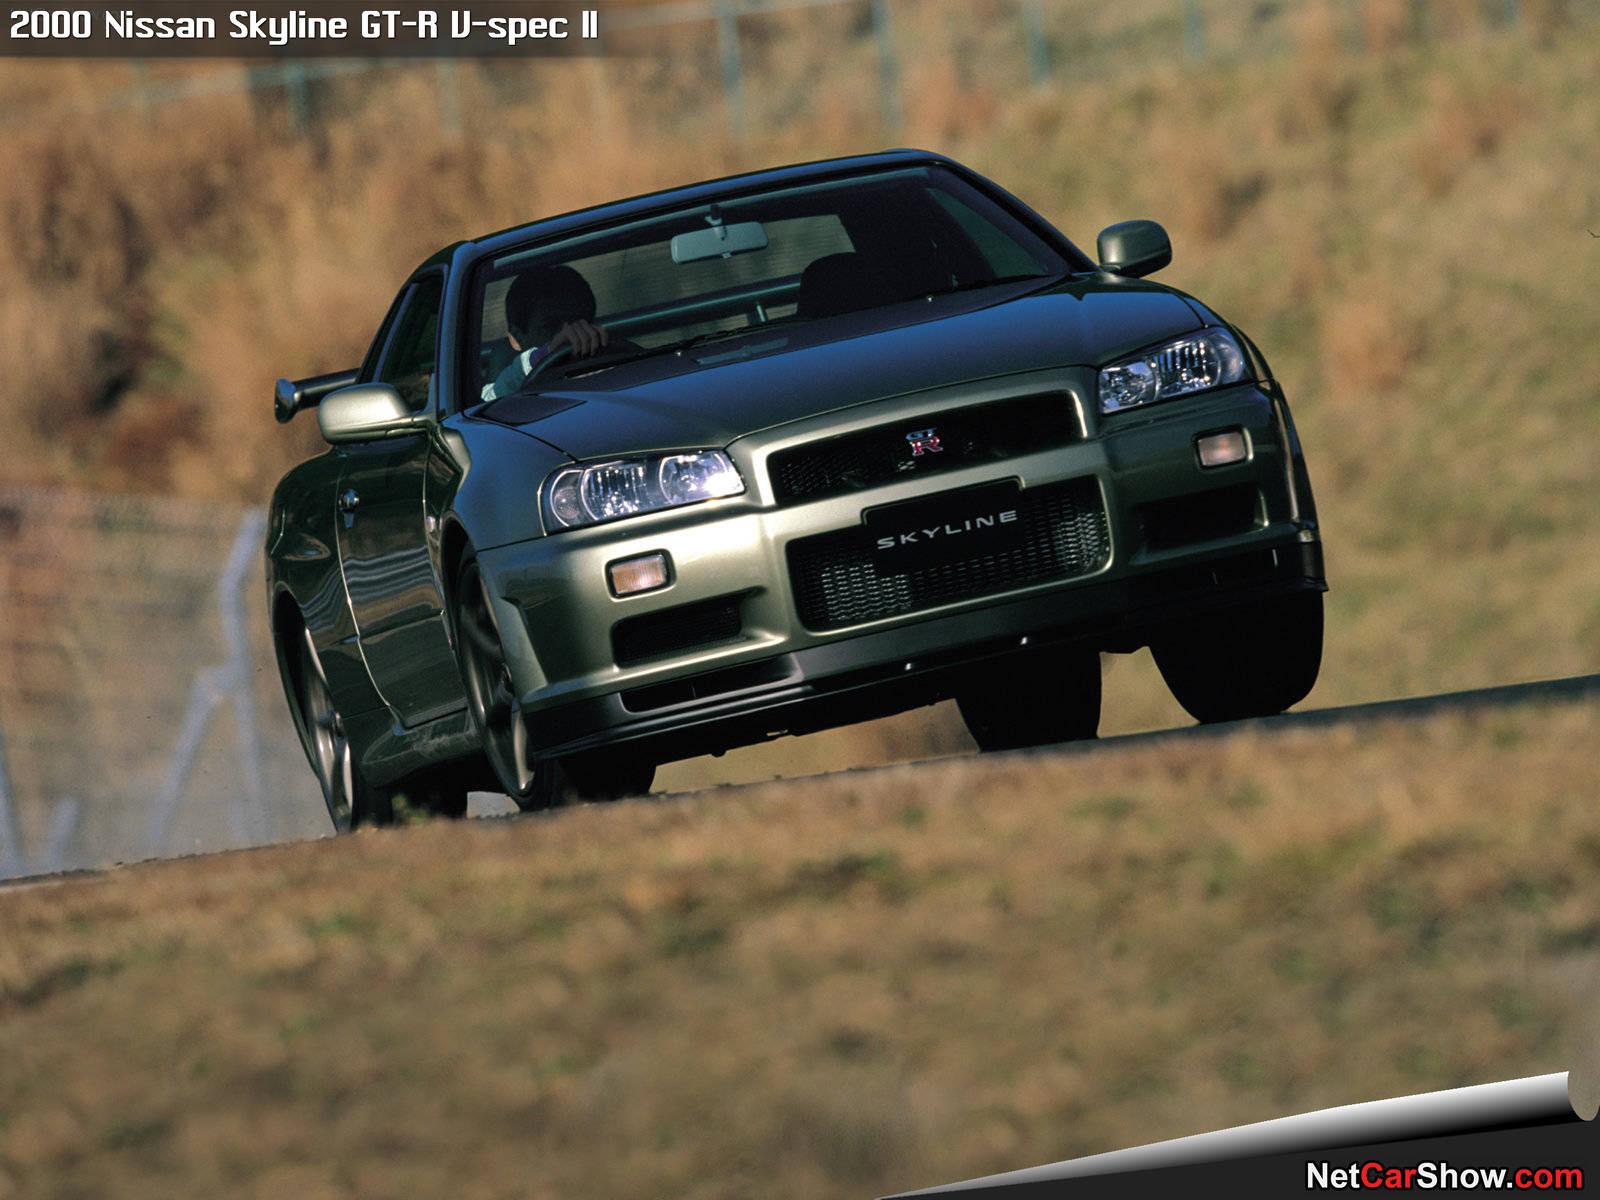 Nissan Skyline GT-R V-spec II (2000)